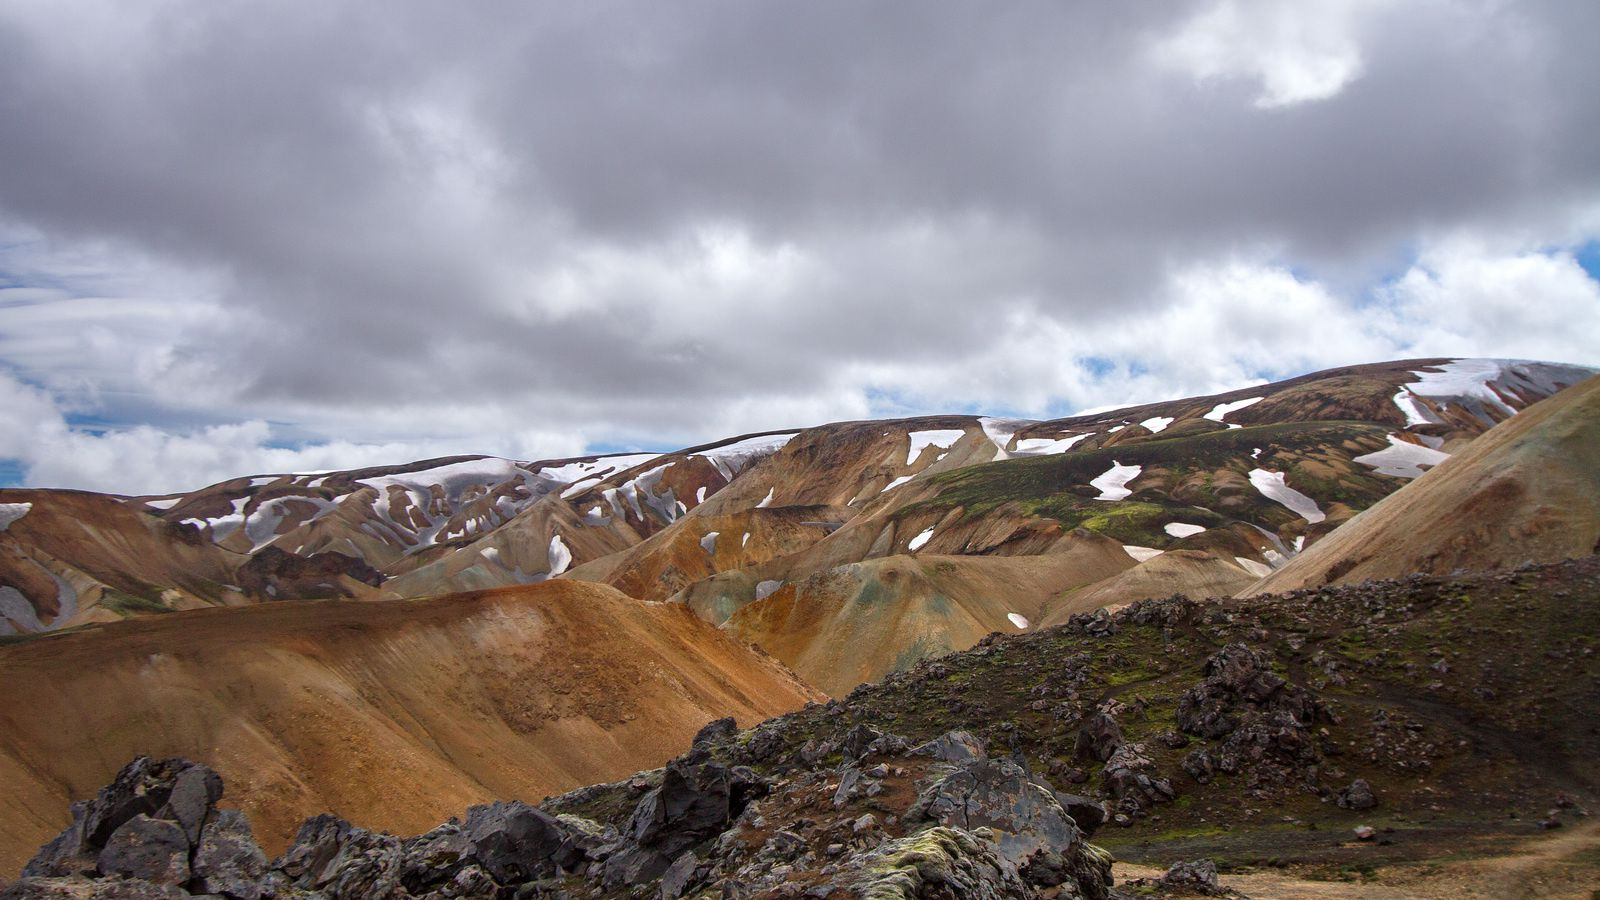 Islande-J2: Gulfoss- Landmannalaugar- Hella